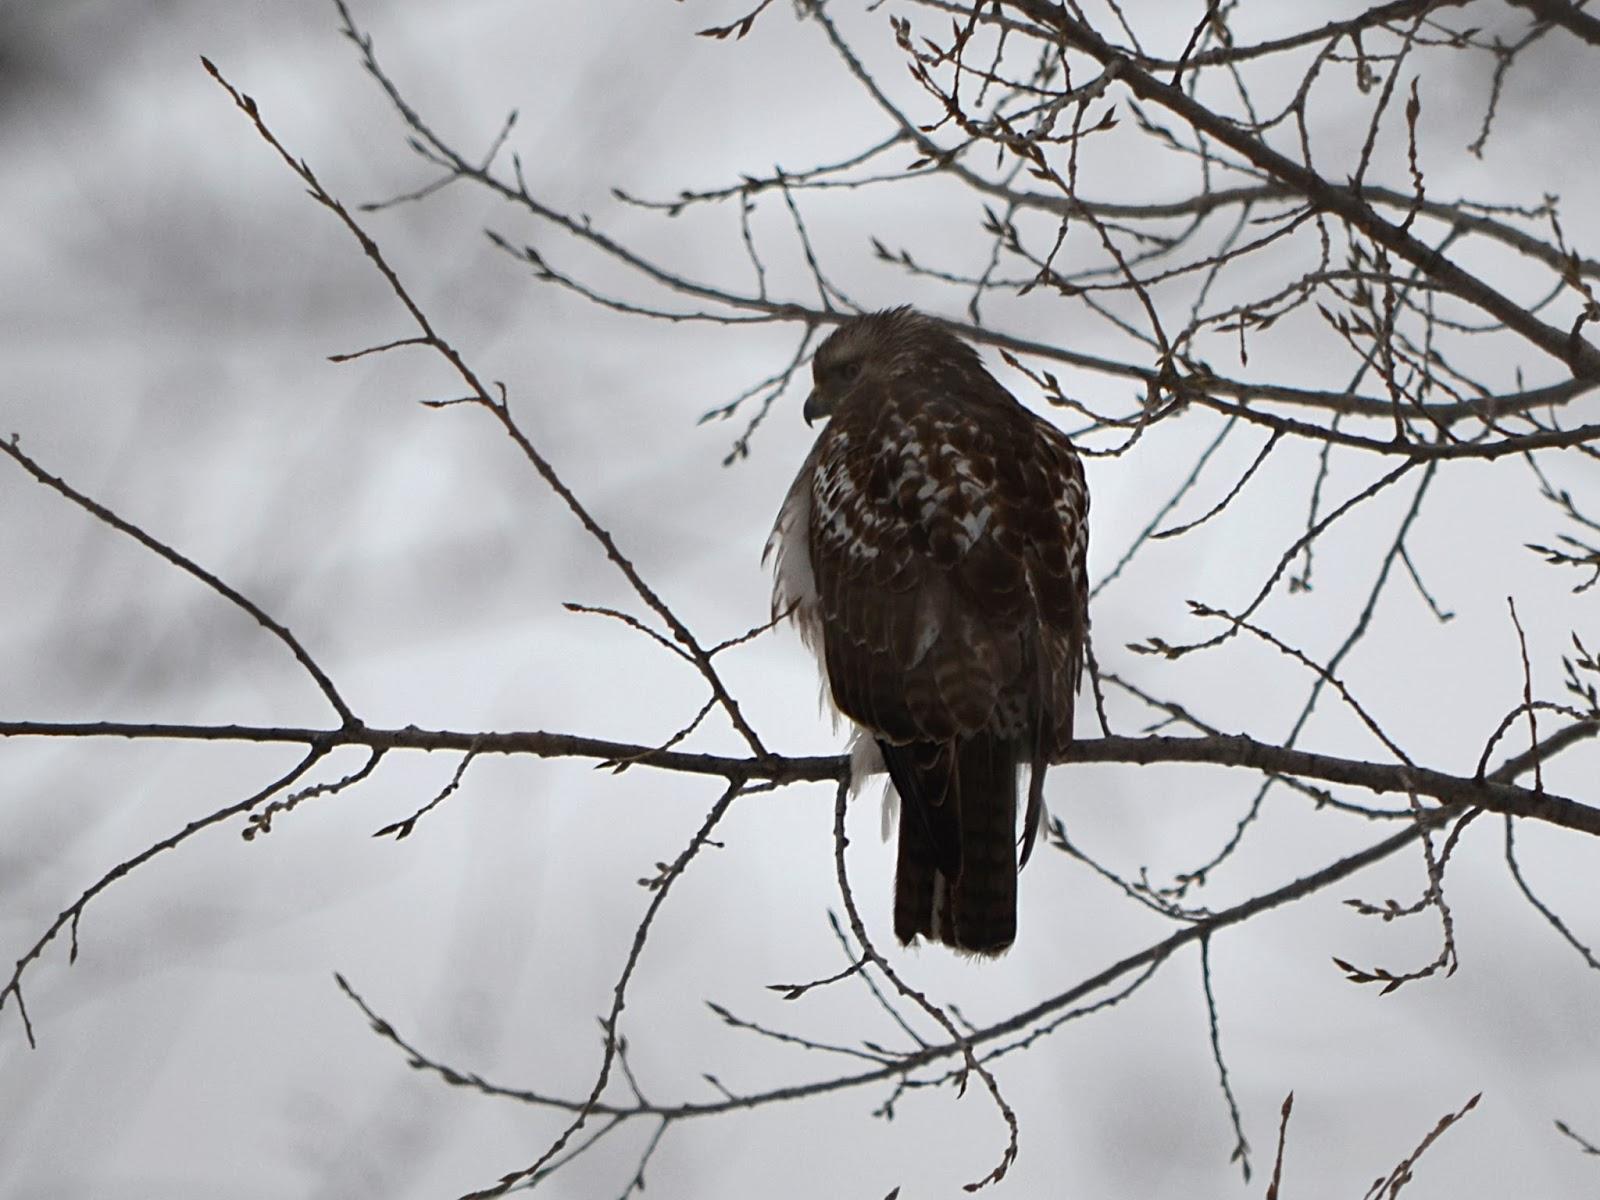 palmer lake park nature blog u2022 great backyard bird count 2014